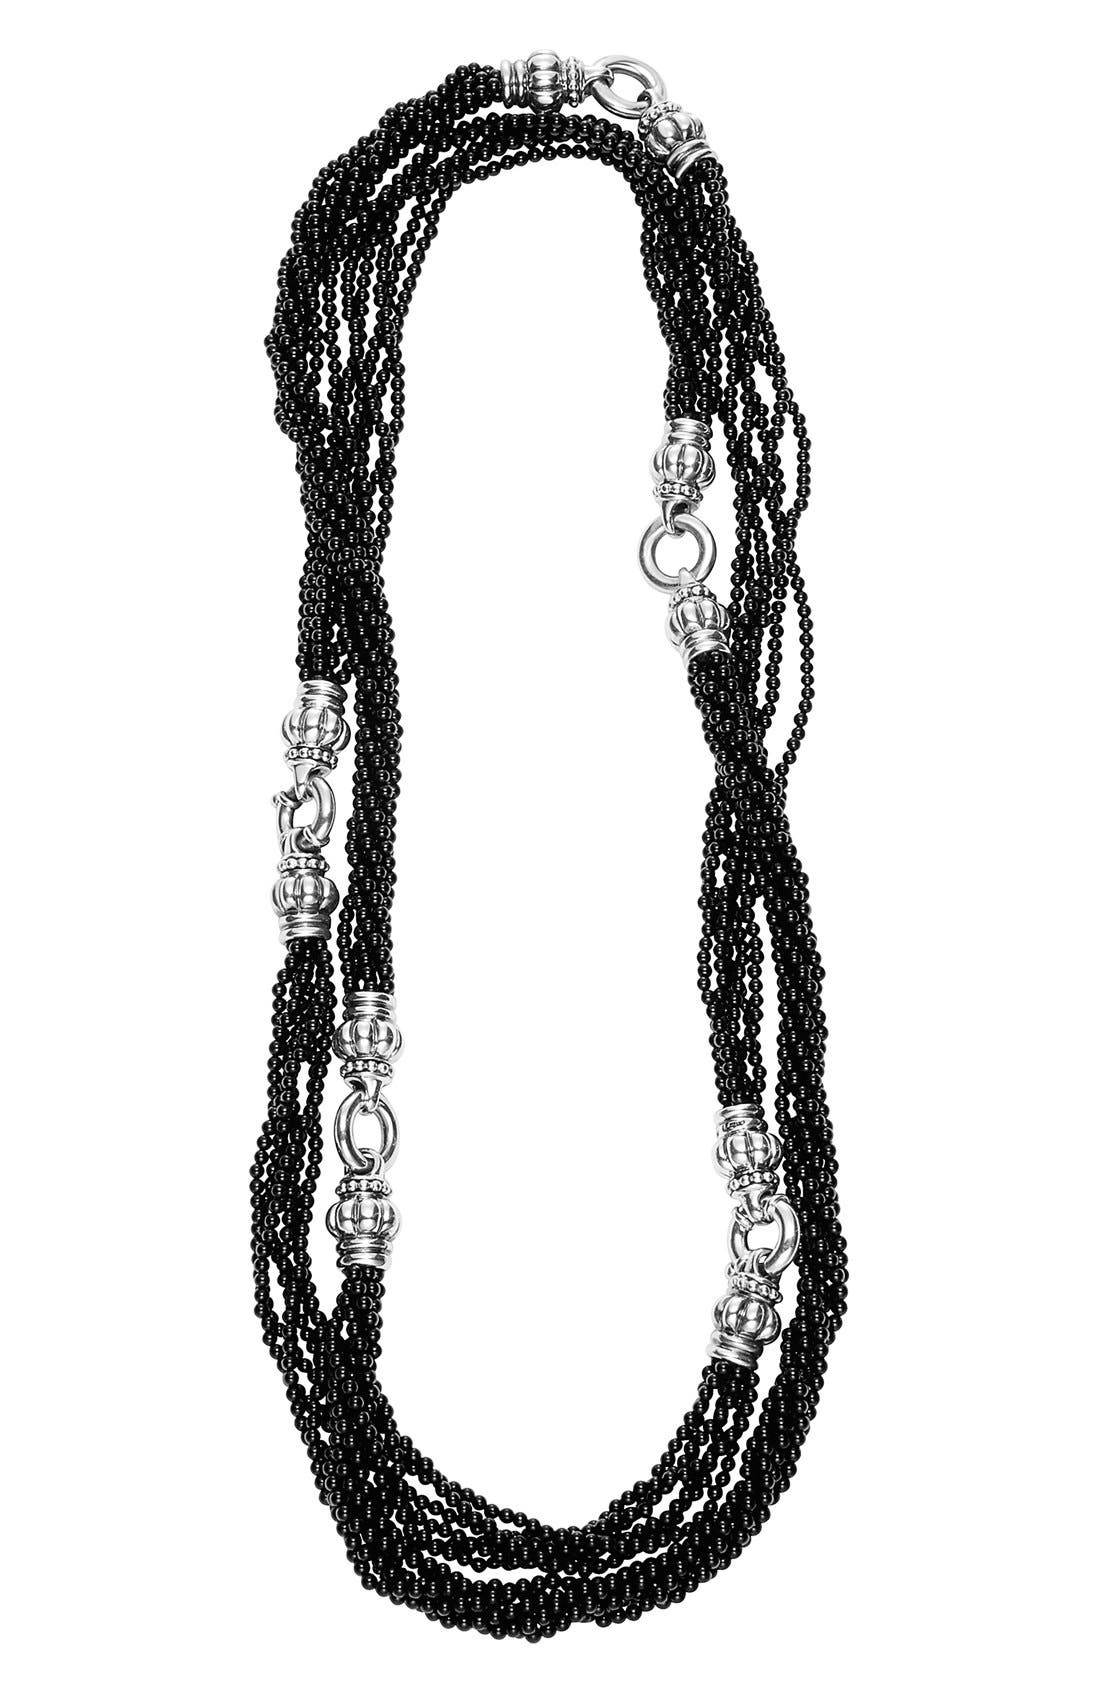 'Black Caviar' Beaded Necklace,                             Main thumbnail 1, color,                             001